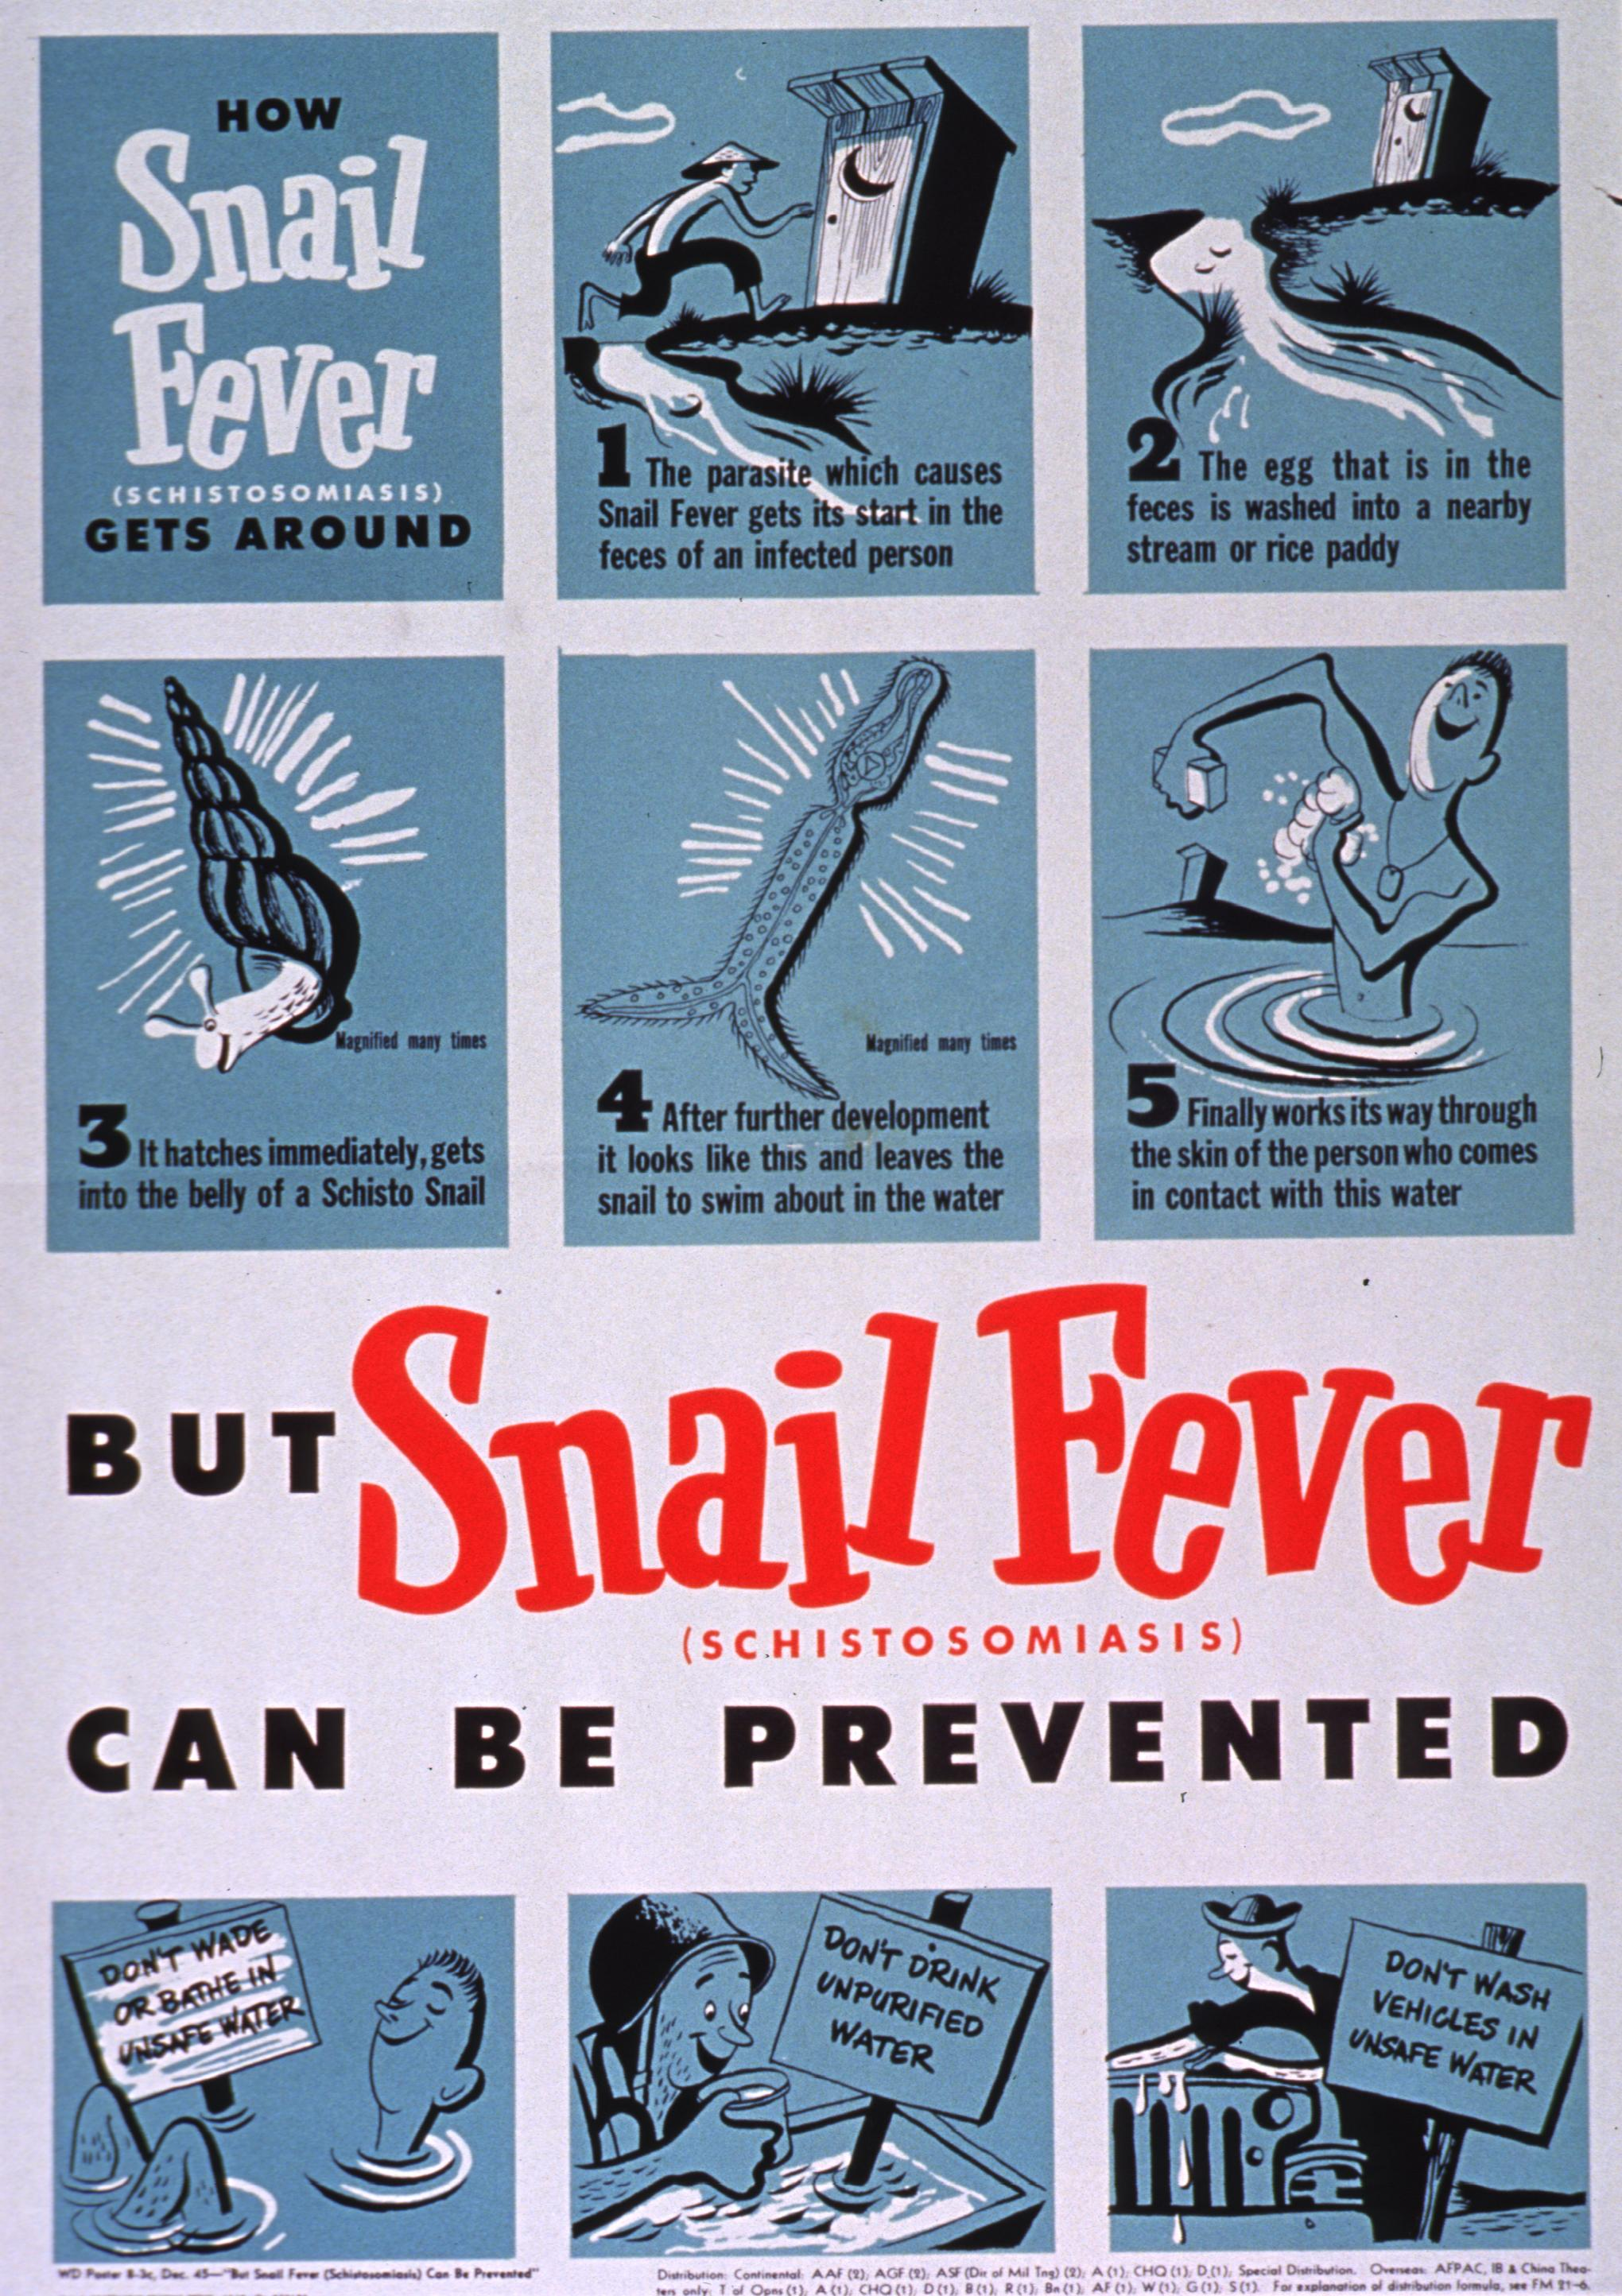 schistosomiasis fever